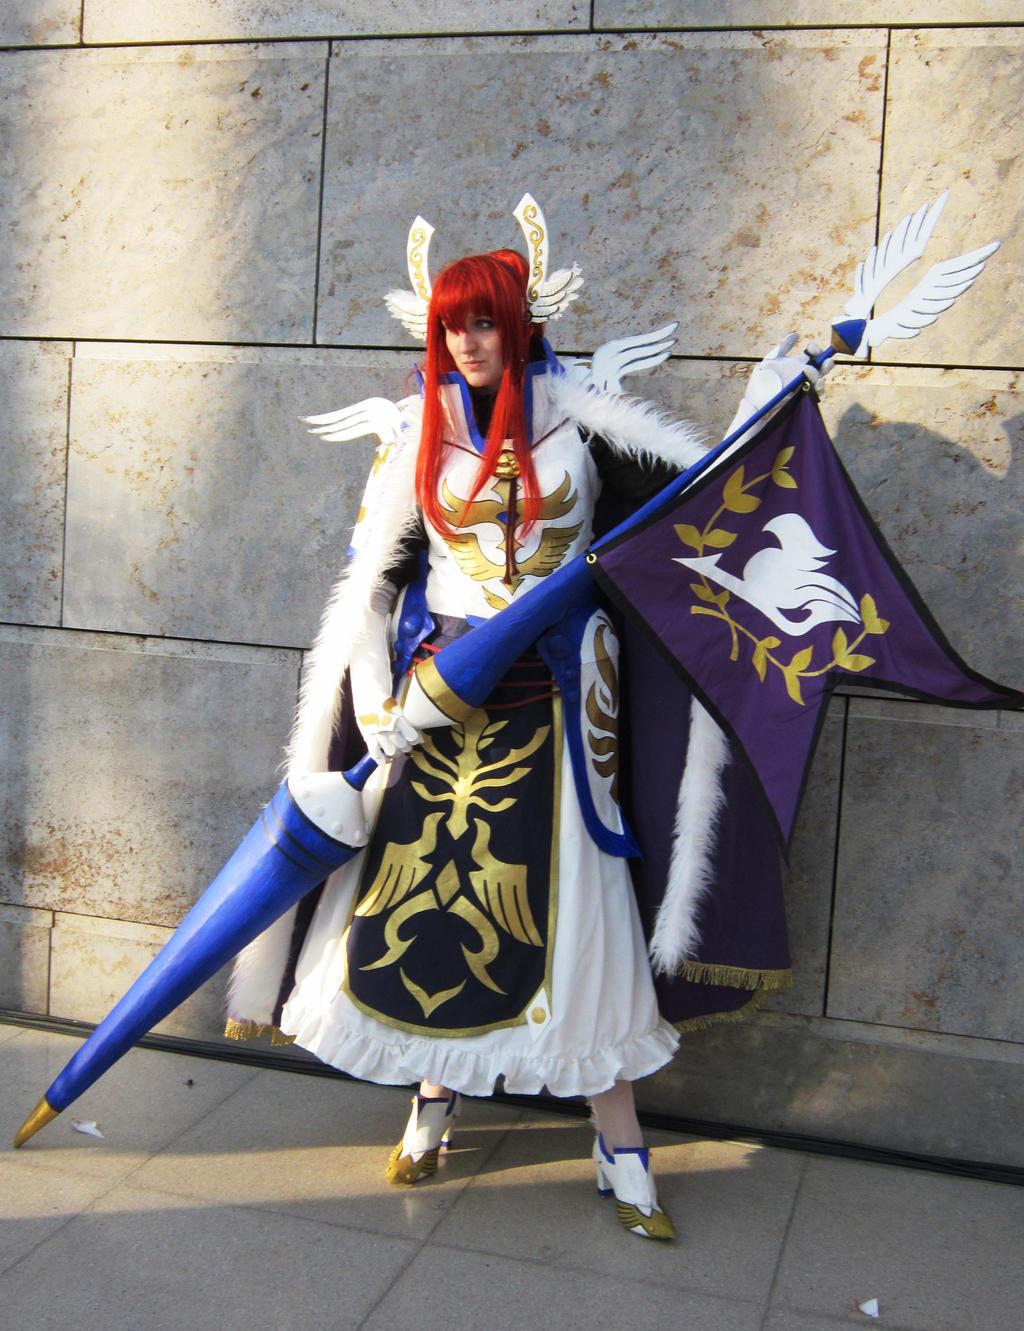 Erza Scarlet Farewell Armor by Bloodynightwish on DeviantArt